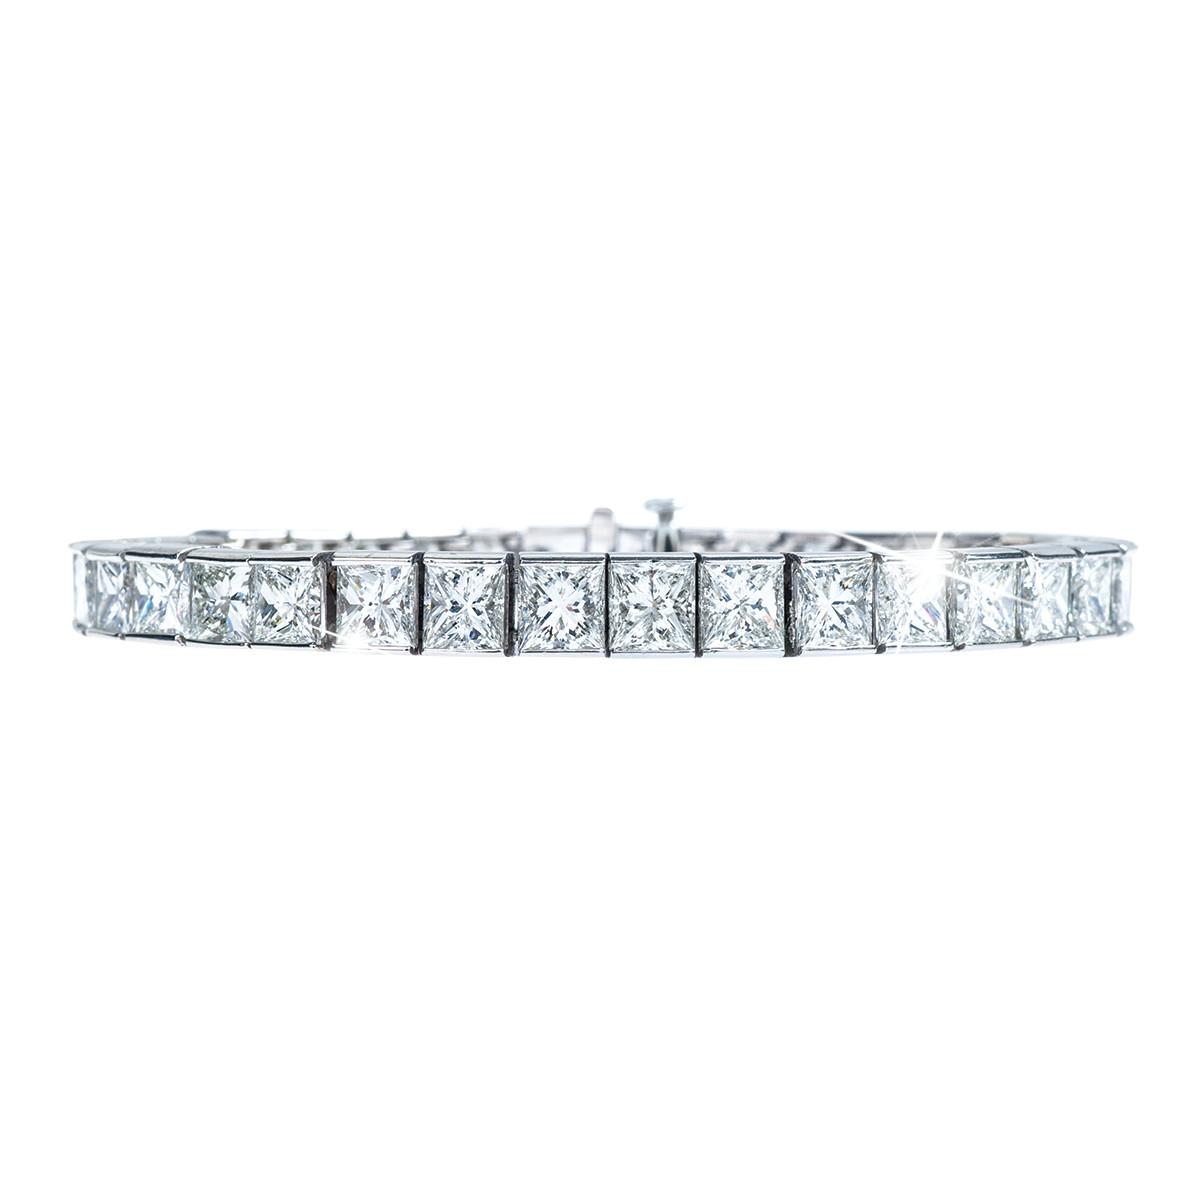 New 15.00 CTW Diamond Tennis Bracelet